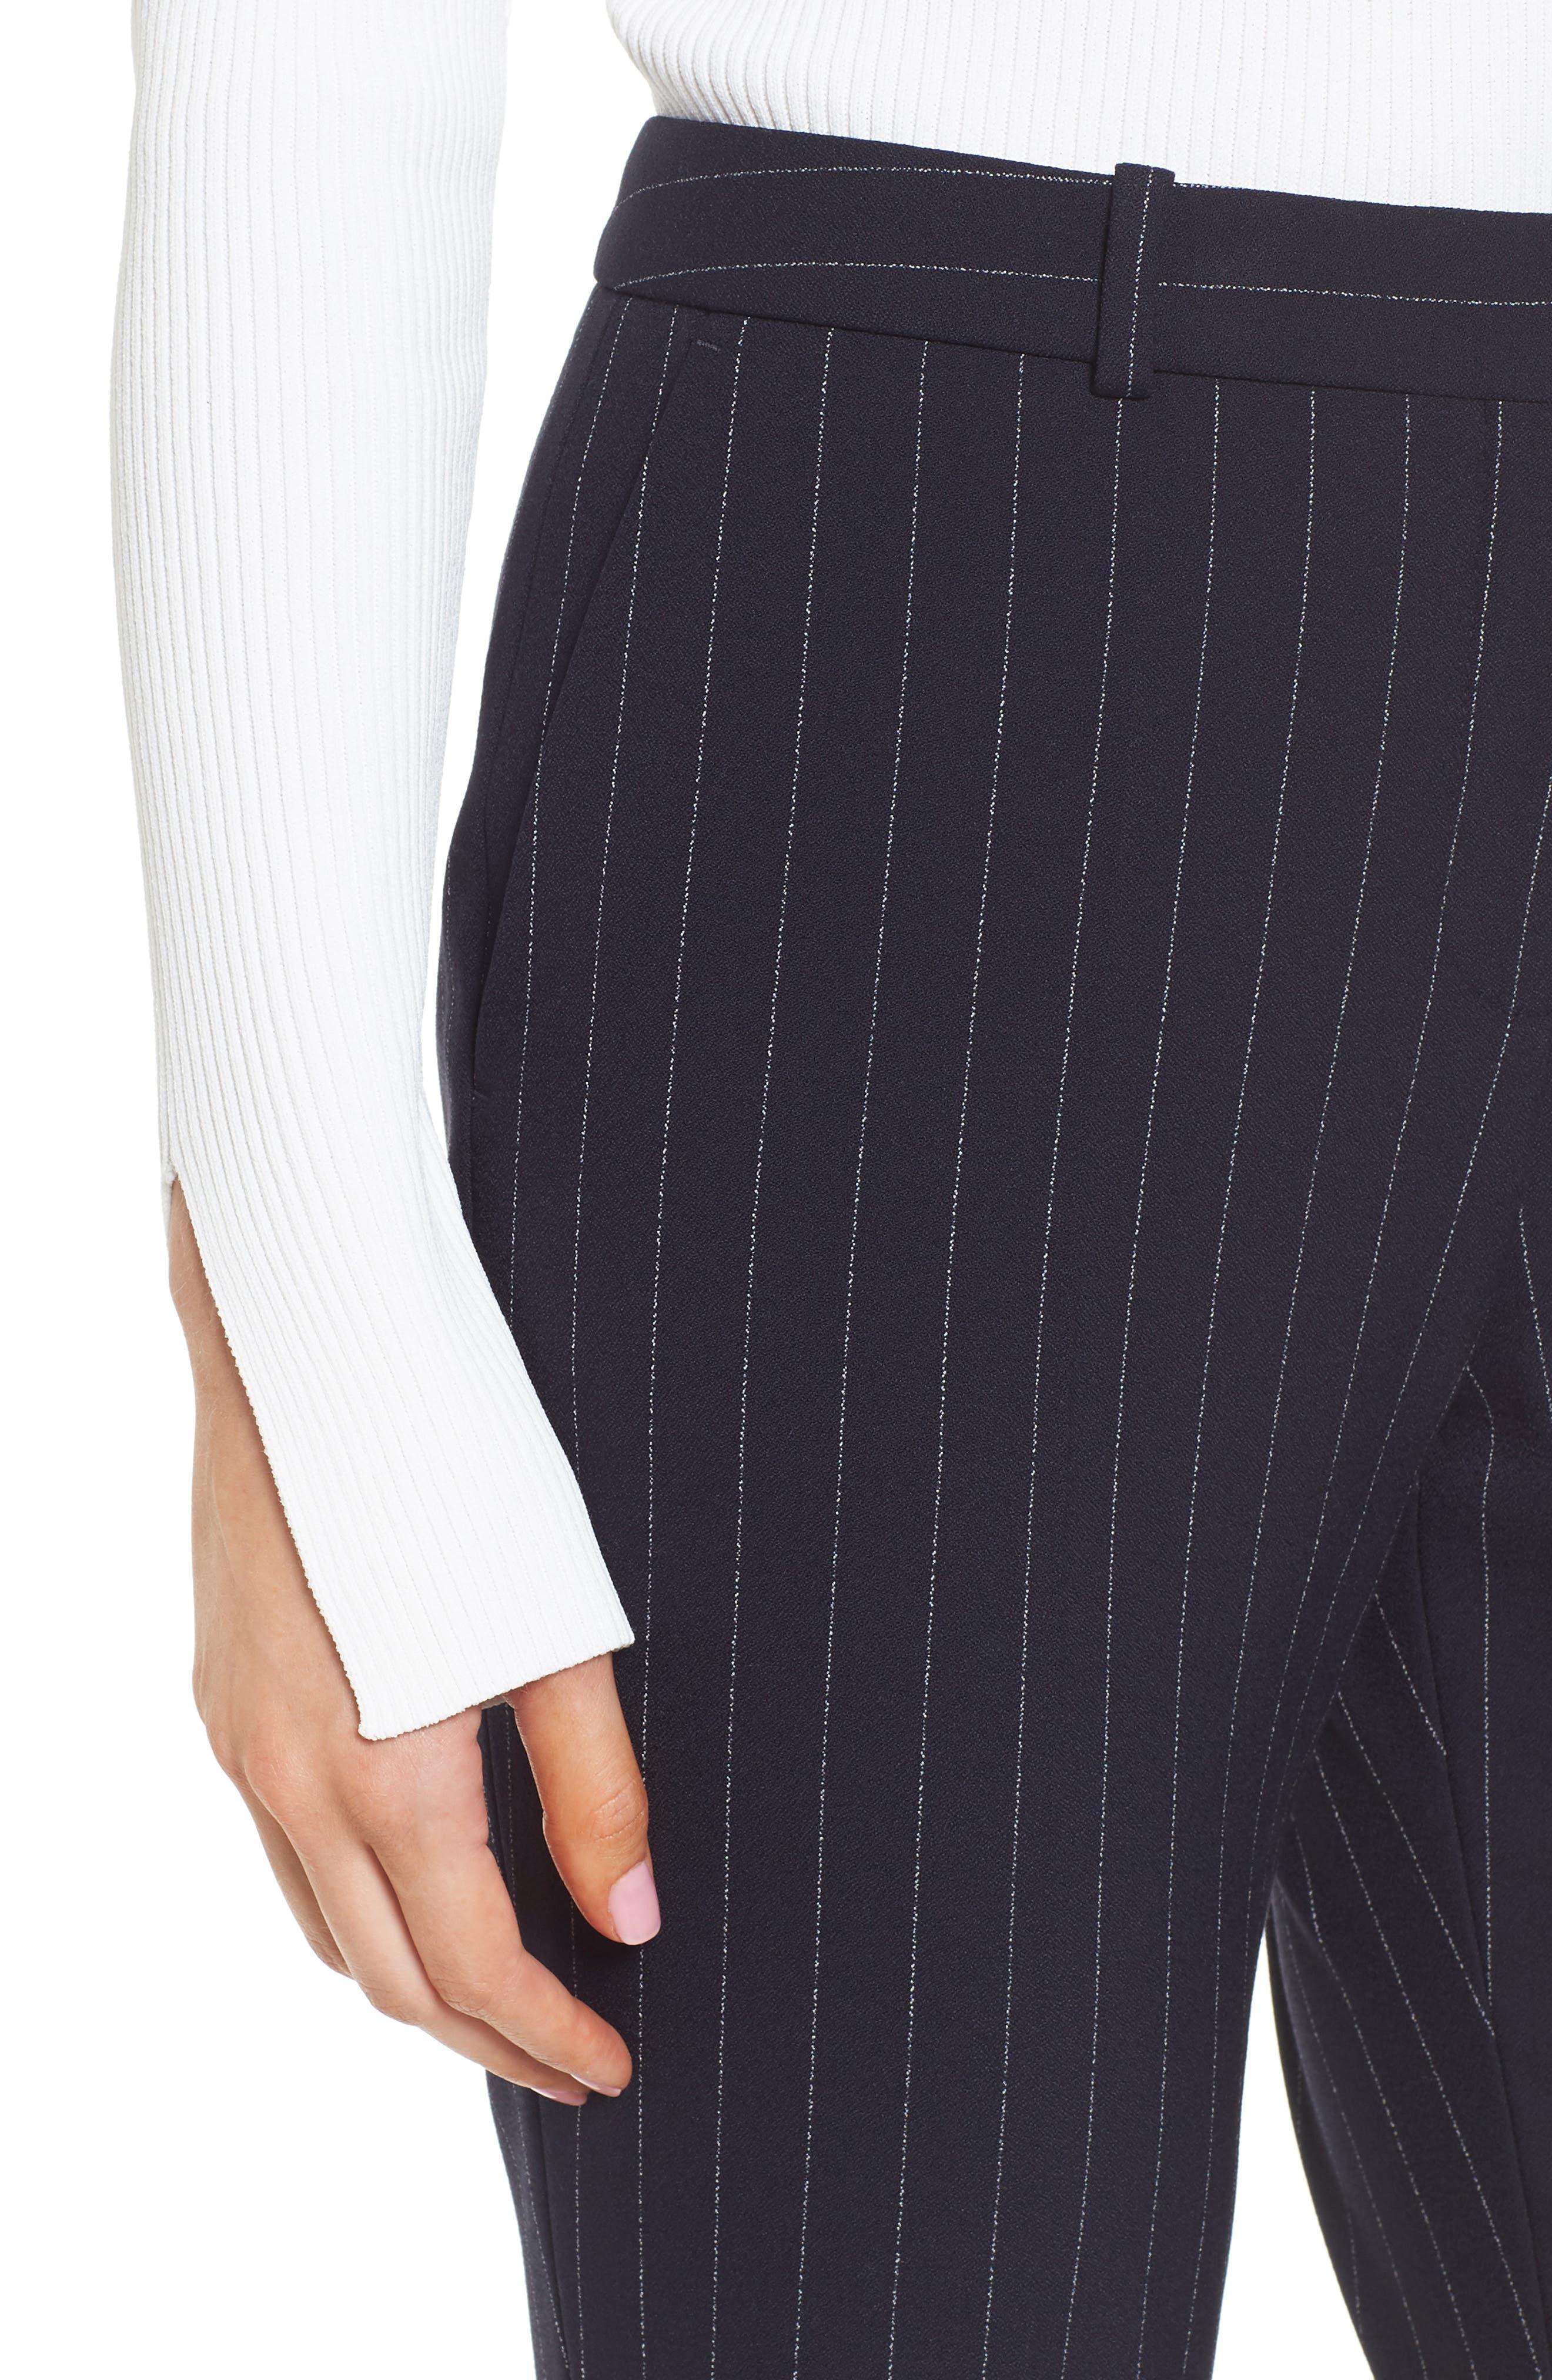 Titana Pinstripe Suit Trousers,                             Alternate thumbnail 4, color,                             461